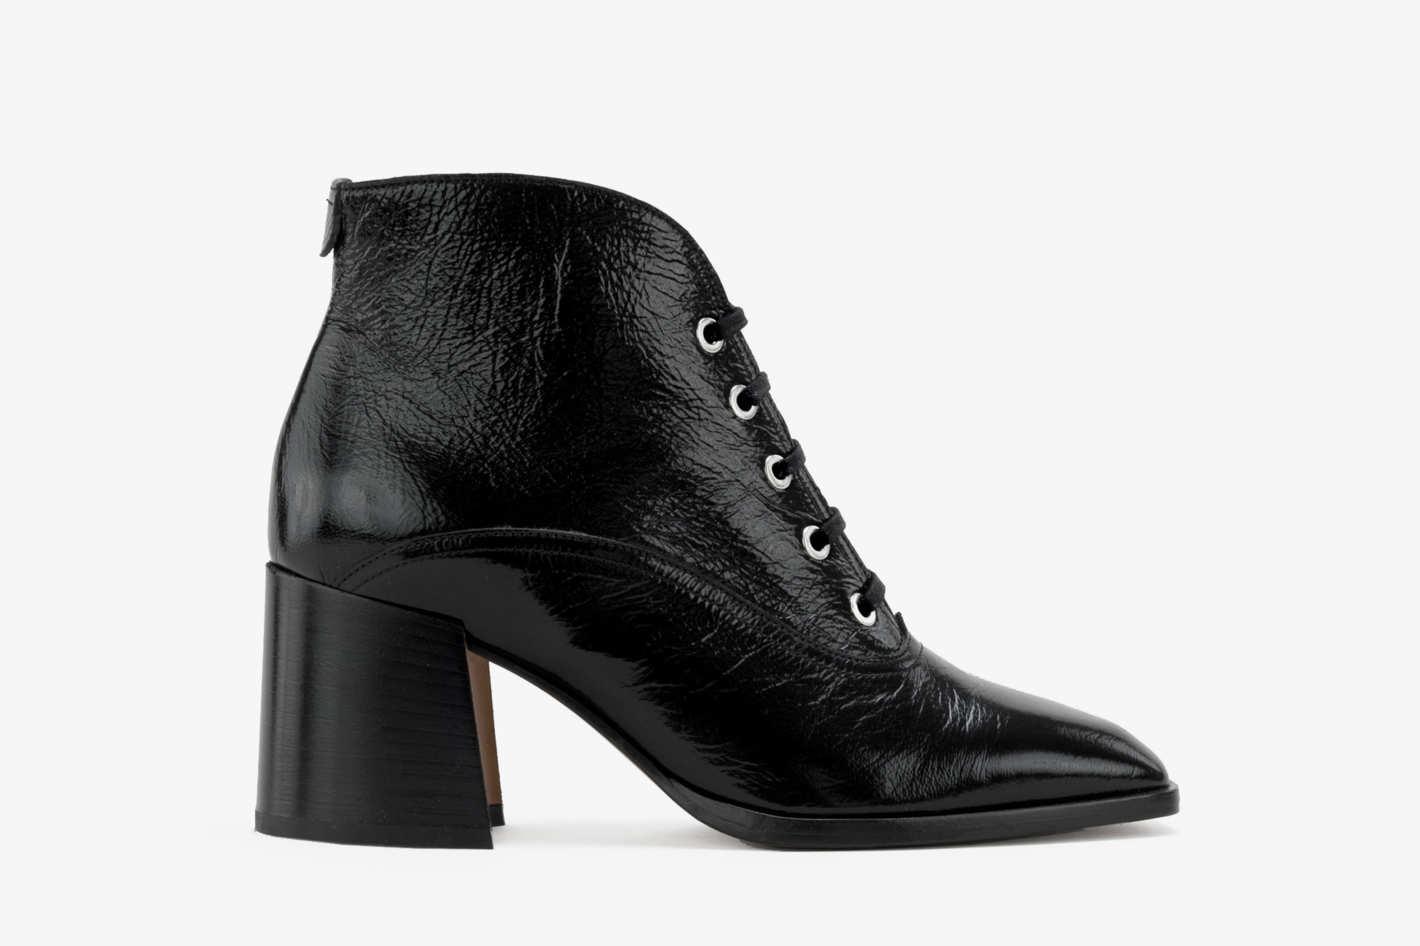 Jil boots in black patent